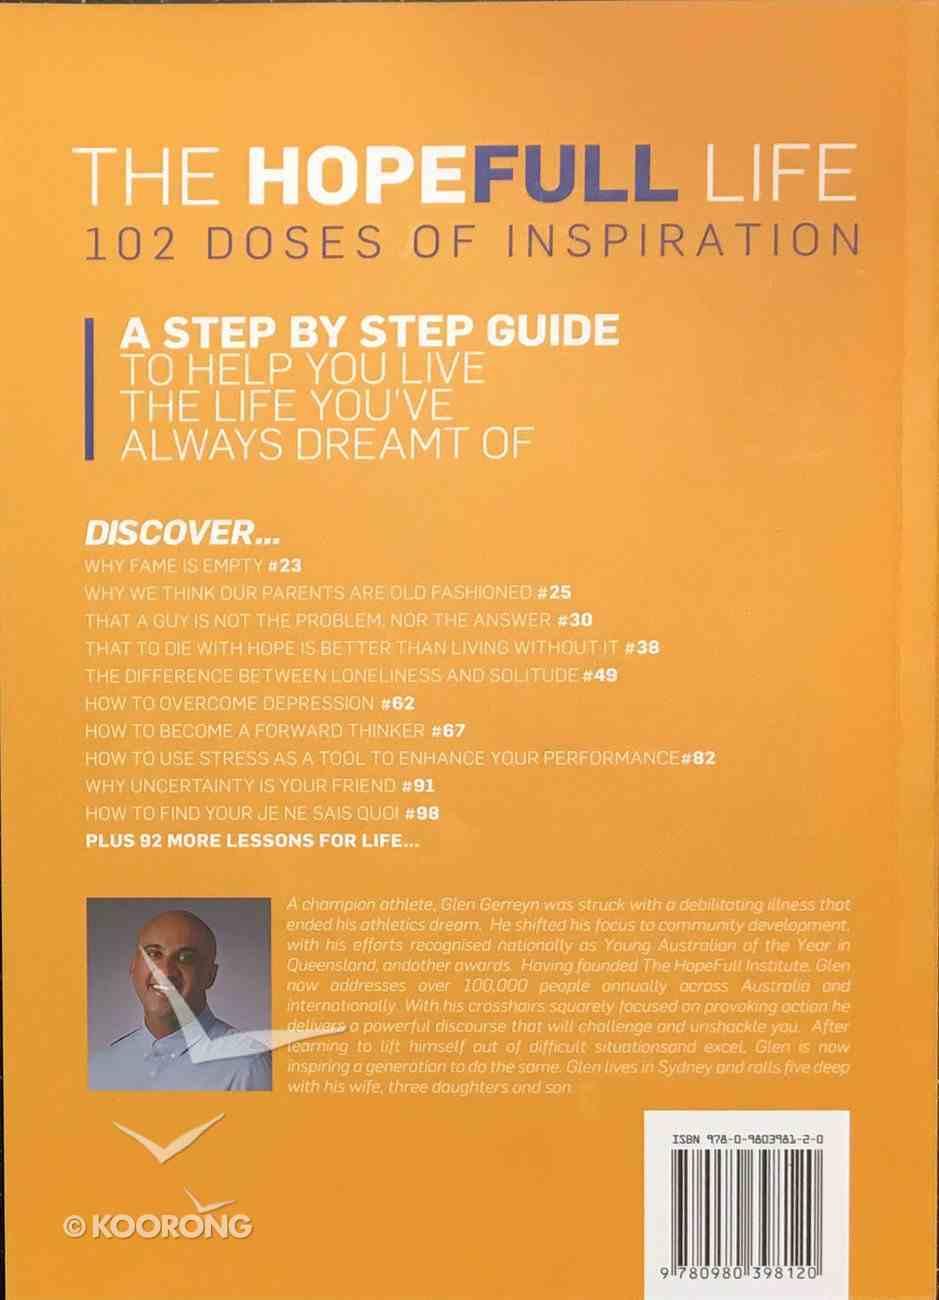 The Hopefull Life: 102 Doses of Inspiration Paperback